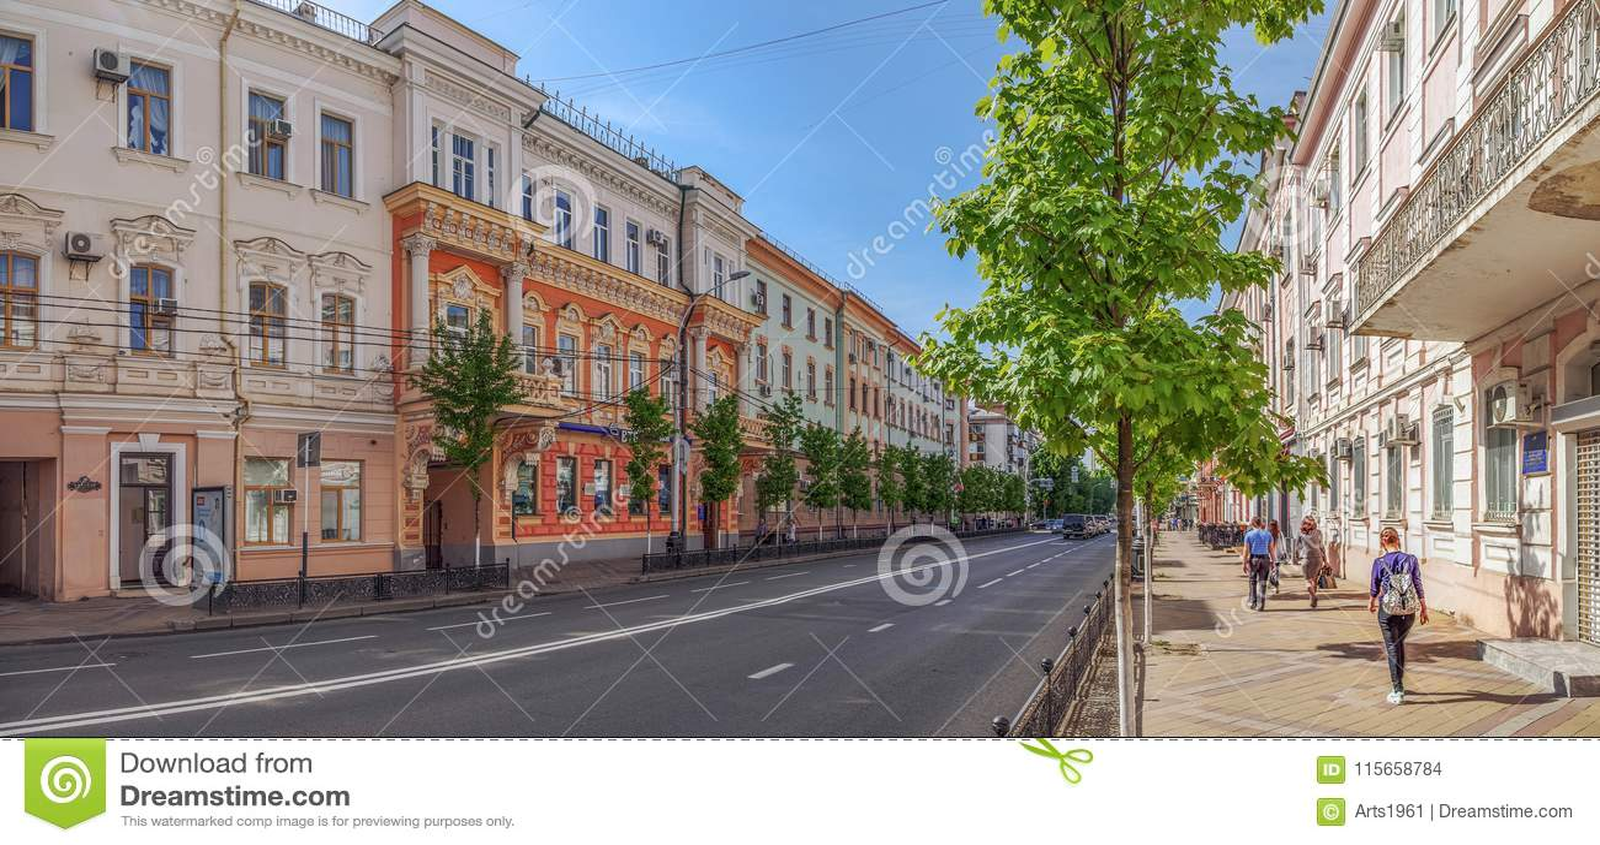 Krasnodar Russia May 3 2017 The Sidewalk On Krasnaya Street Editorial Stock Image Image Of Landscape Editorial 115658784